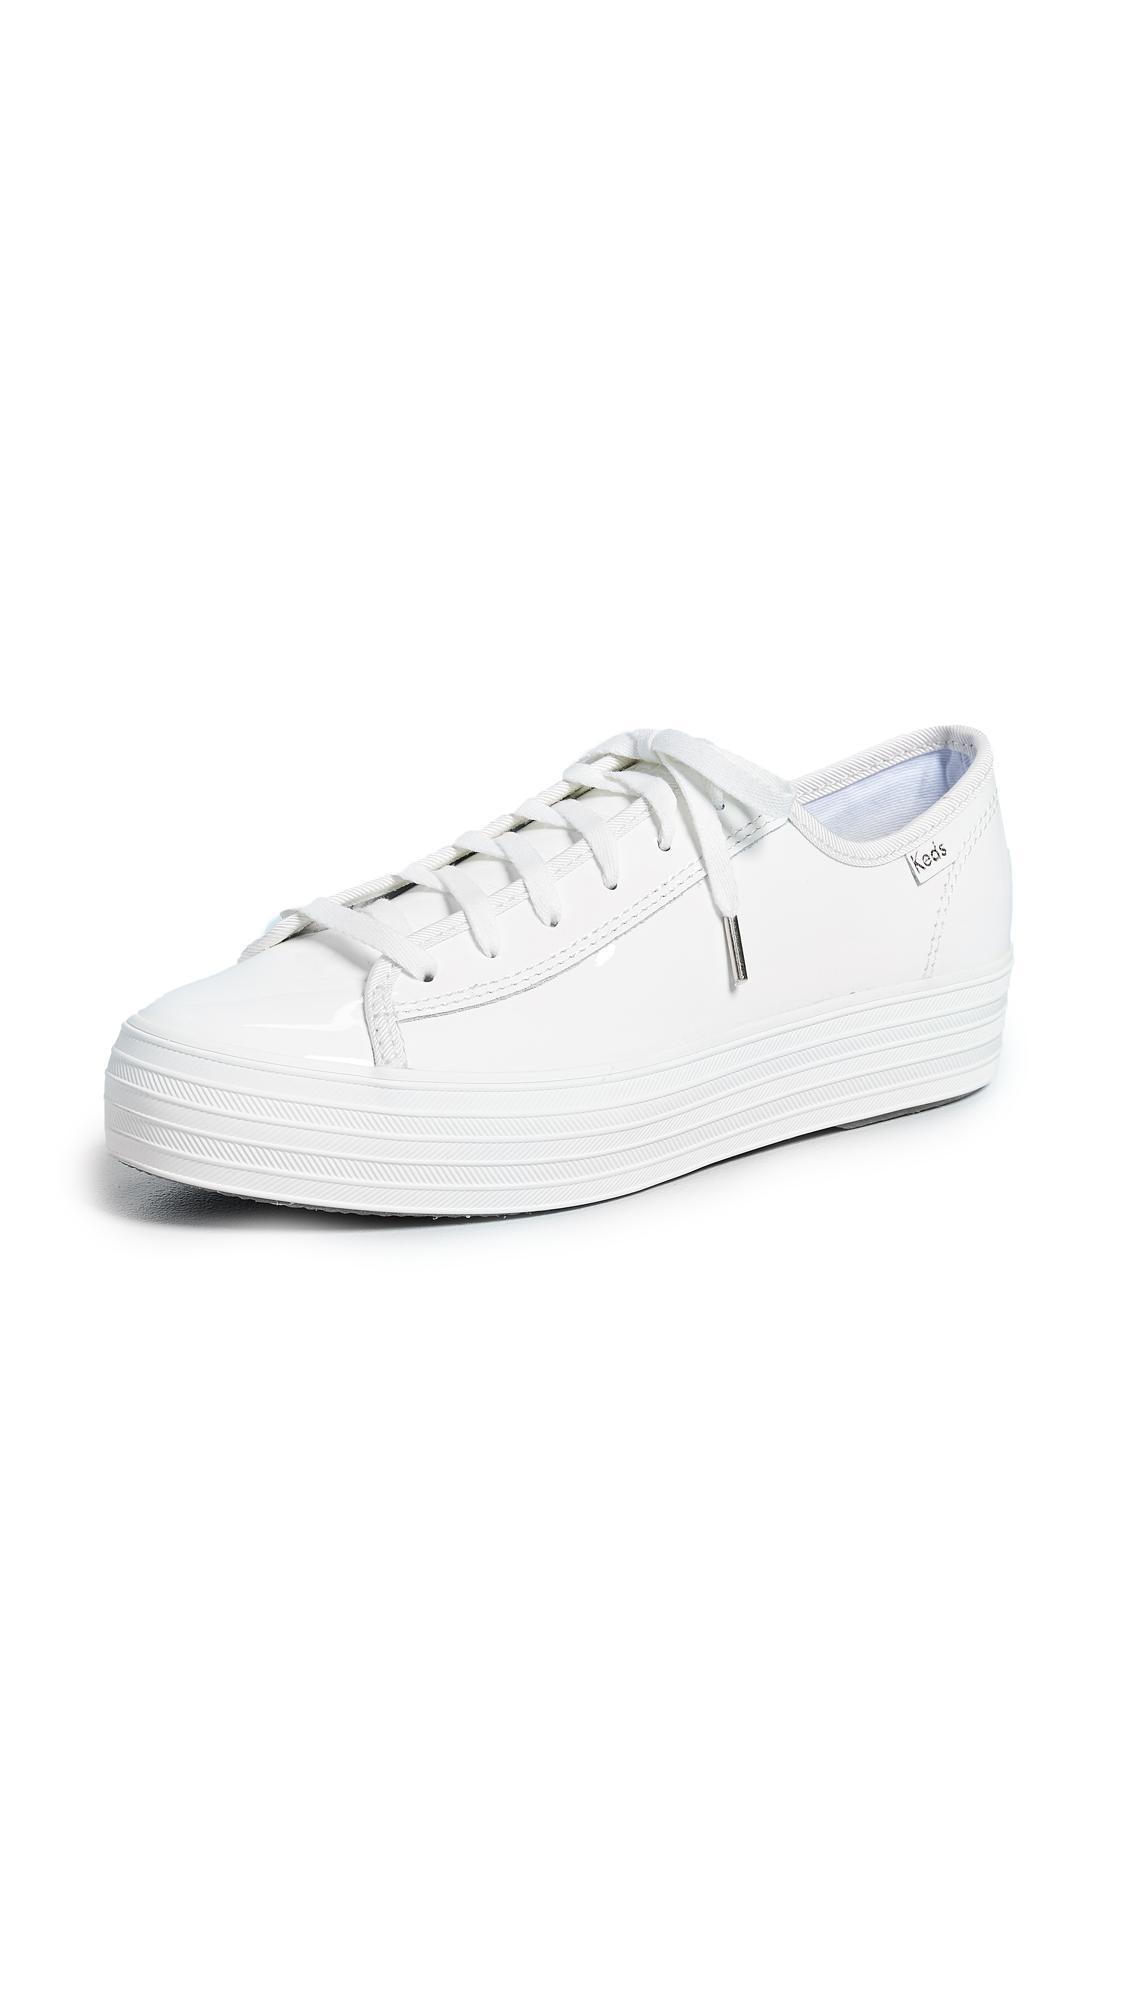 e23b377edbbf5 Keds Triple Kick Patent Sneakers In White